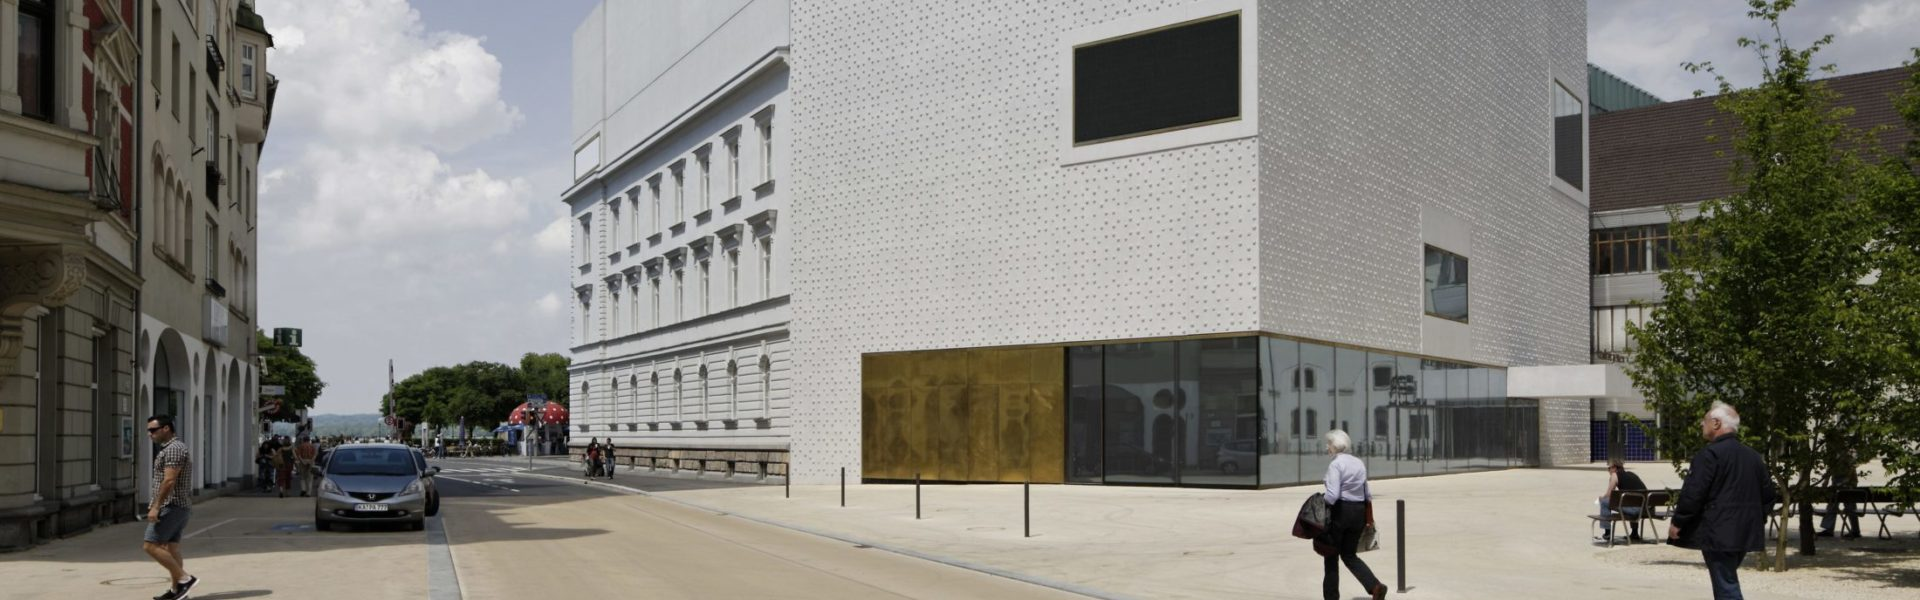 vorarlberg museum, Bregenz, Kornmarkt (c) Hanspeter Schiess